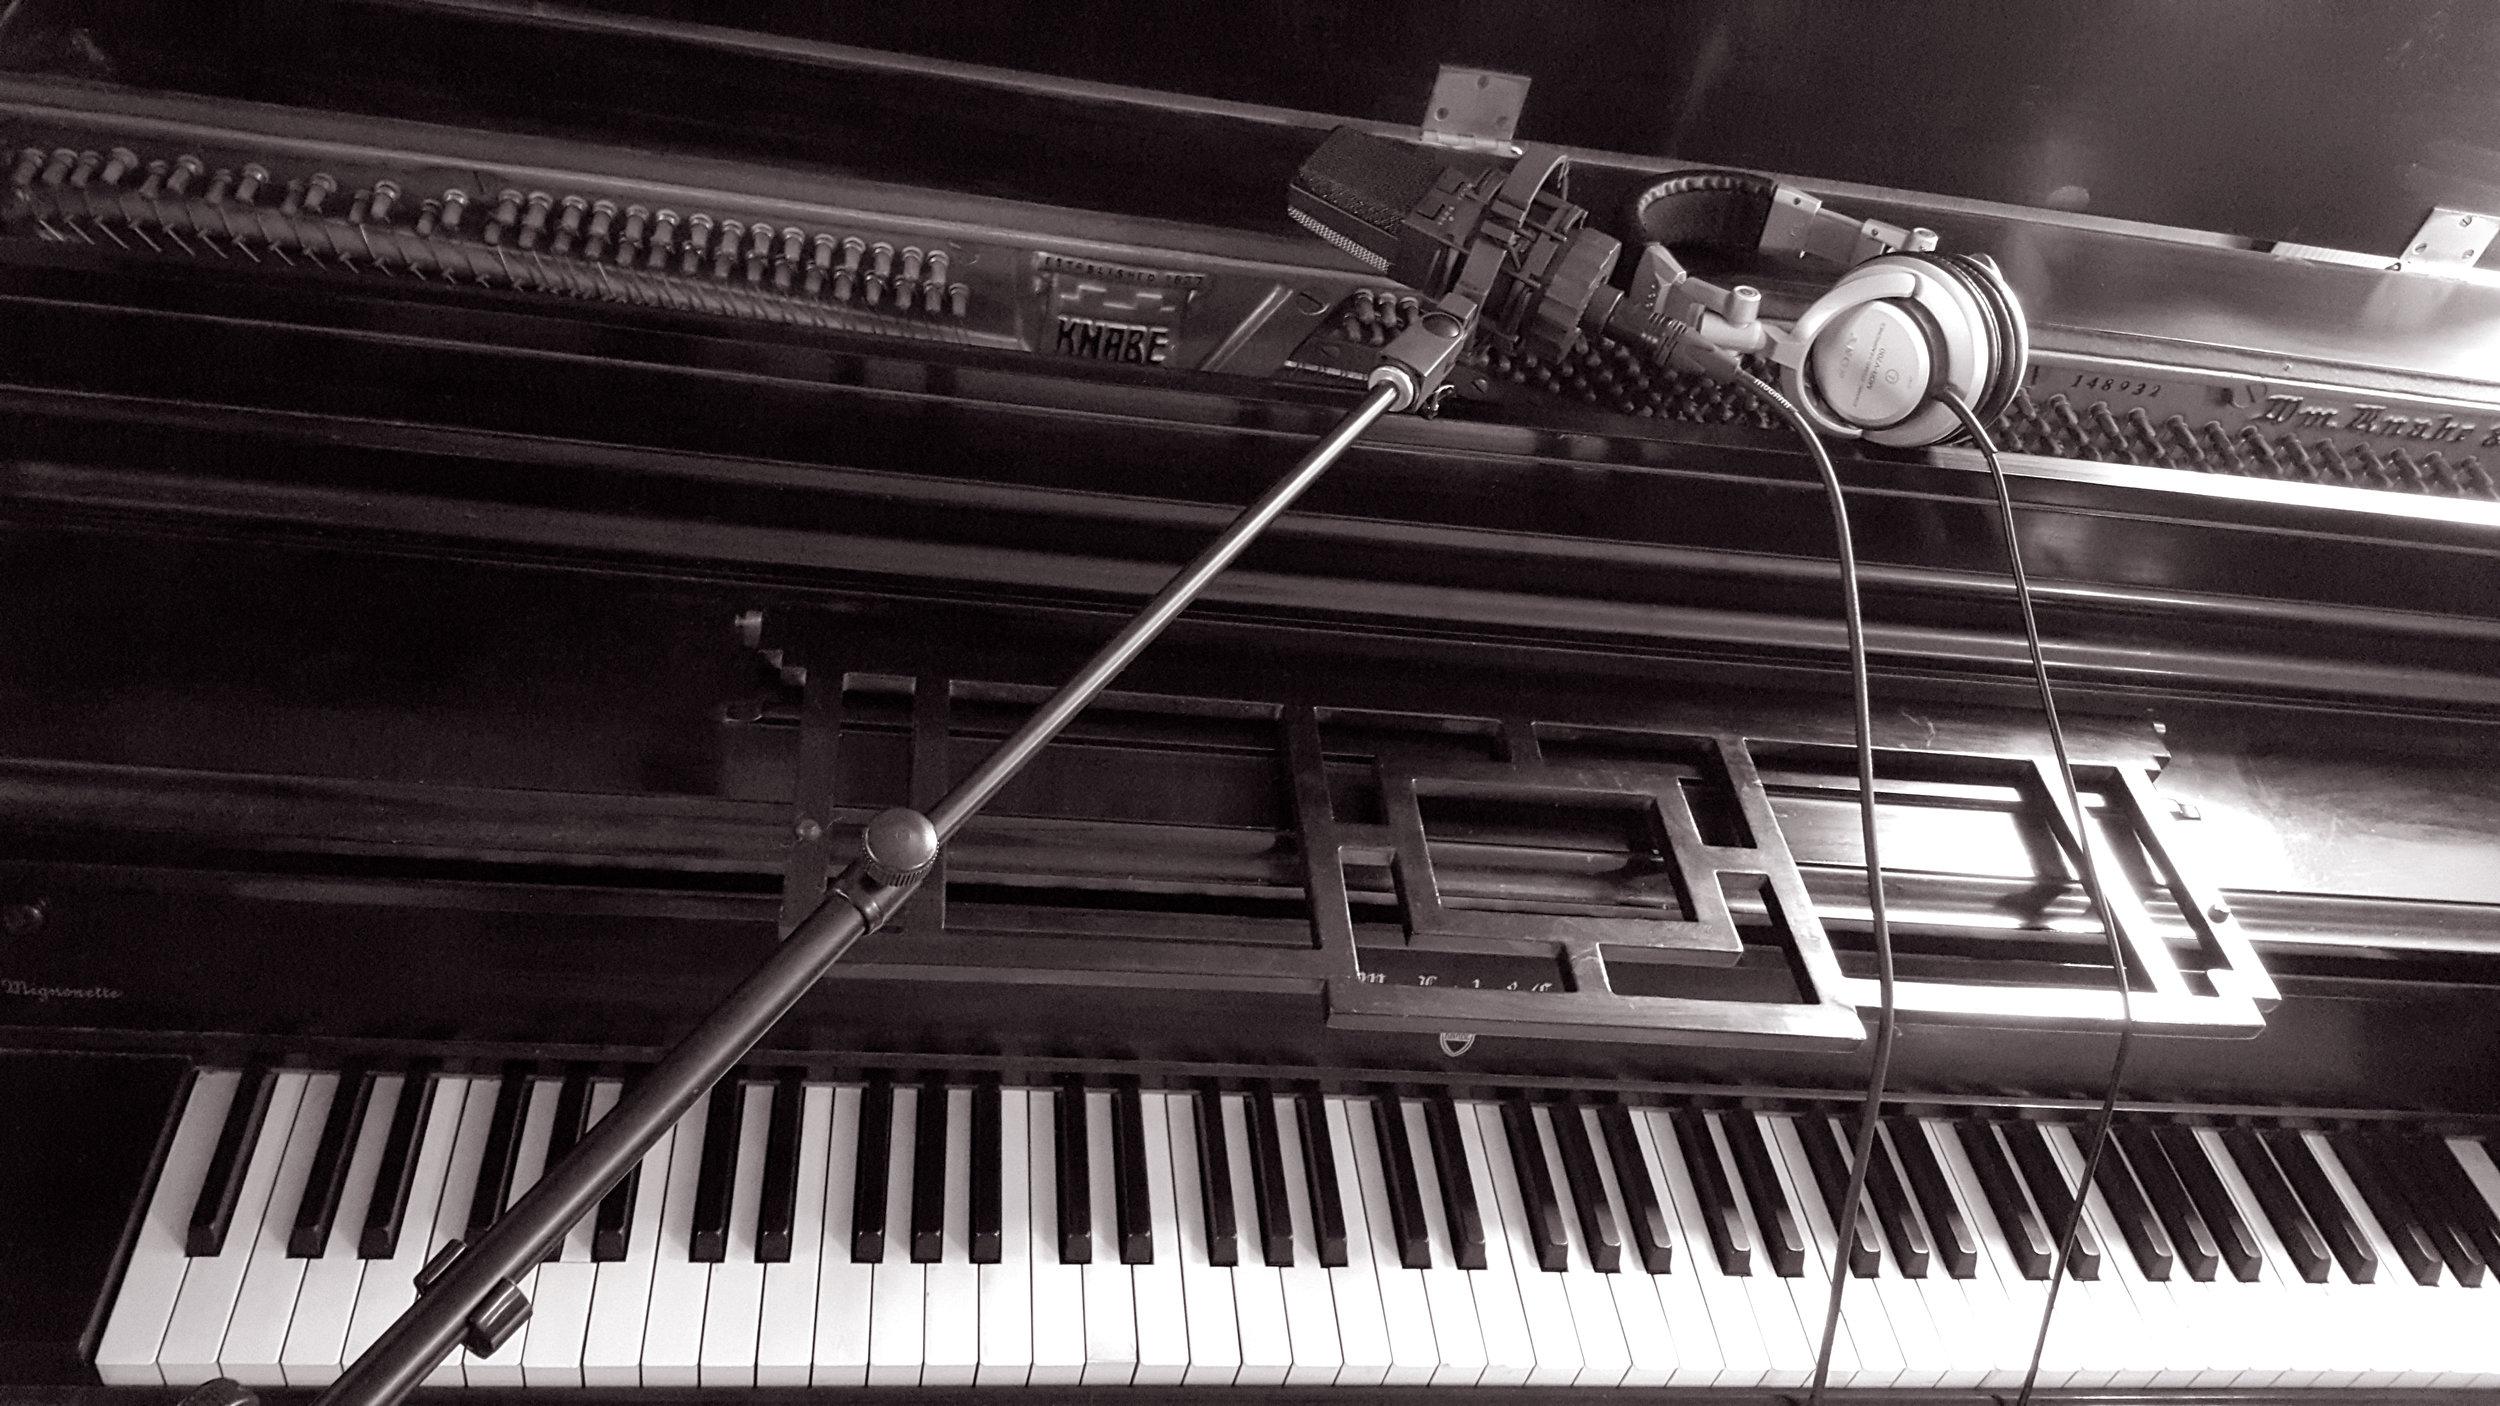 1_16_16-2-Alameda Piano Tracking.jpg